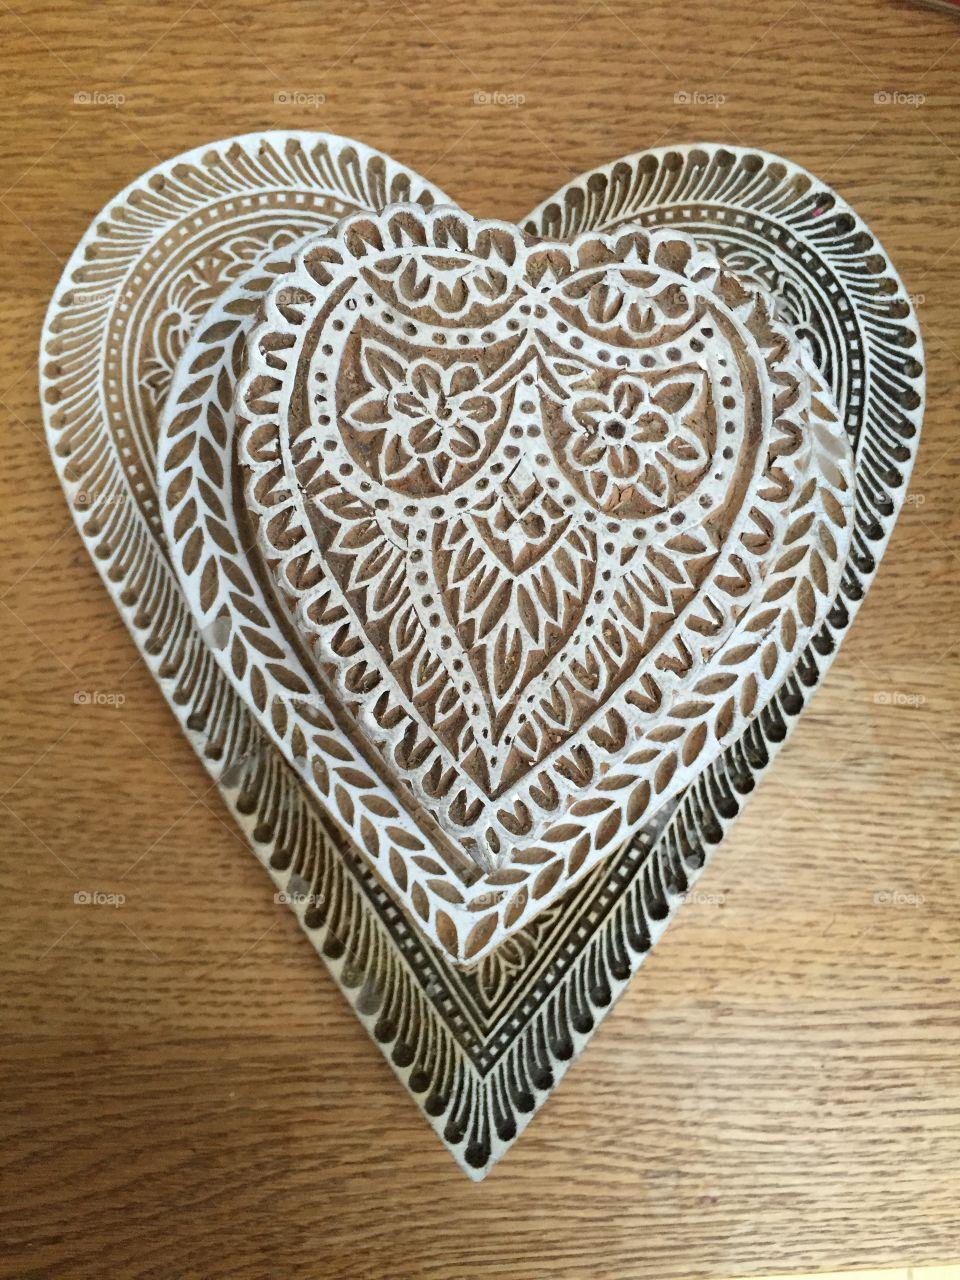 Heart carvings